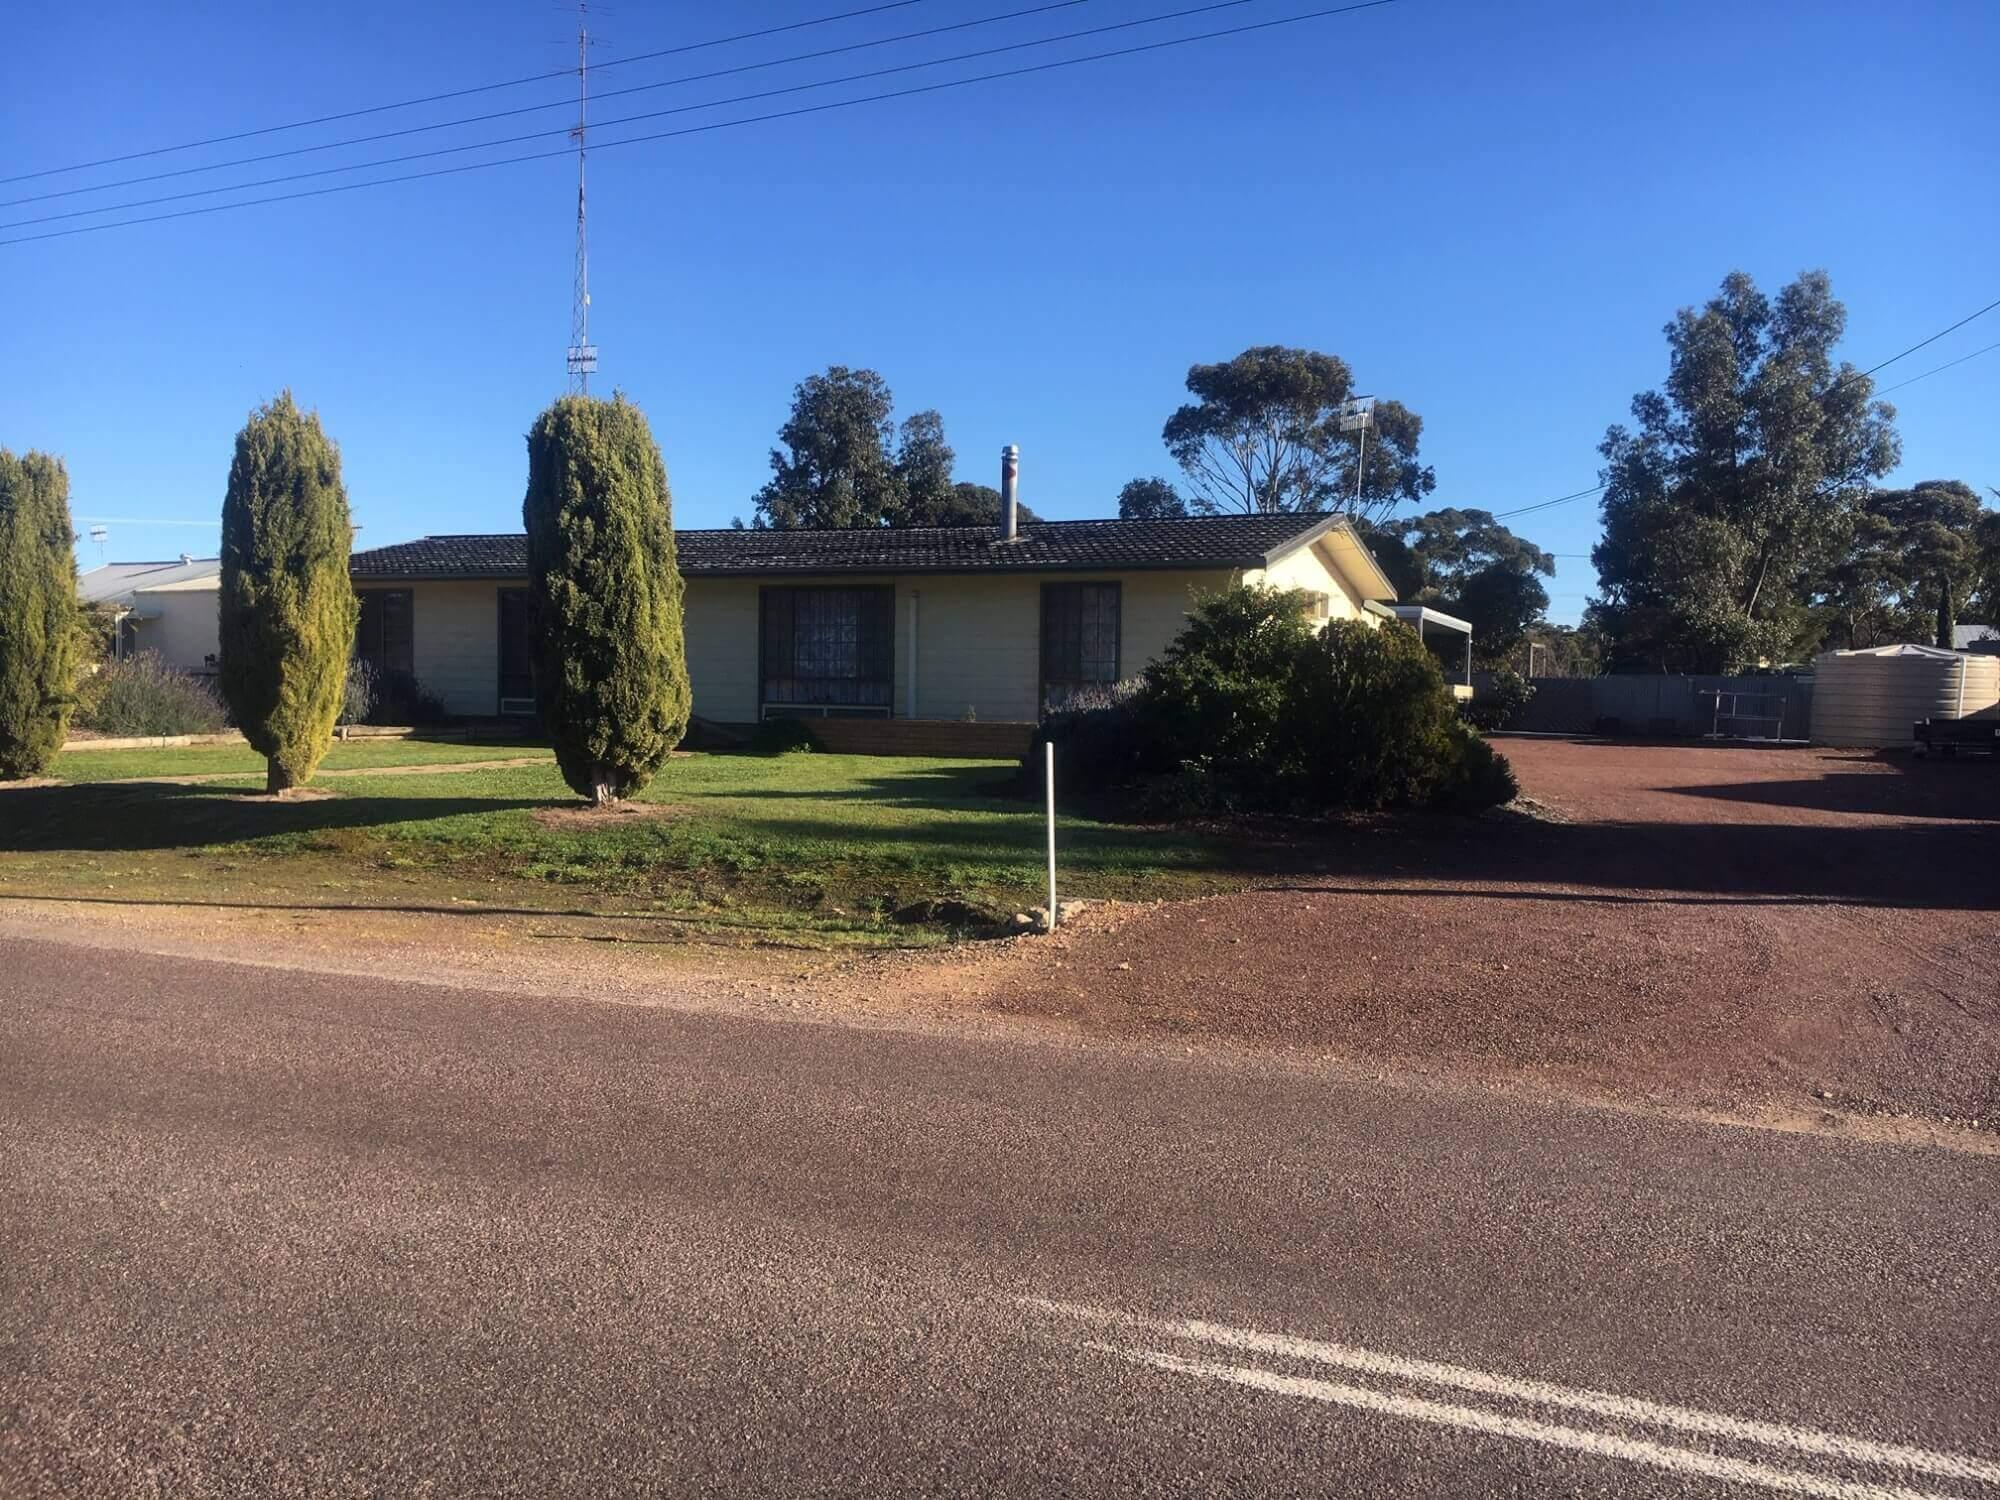 15 Birdseye Highway Lock SA 5633